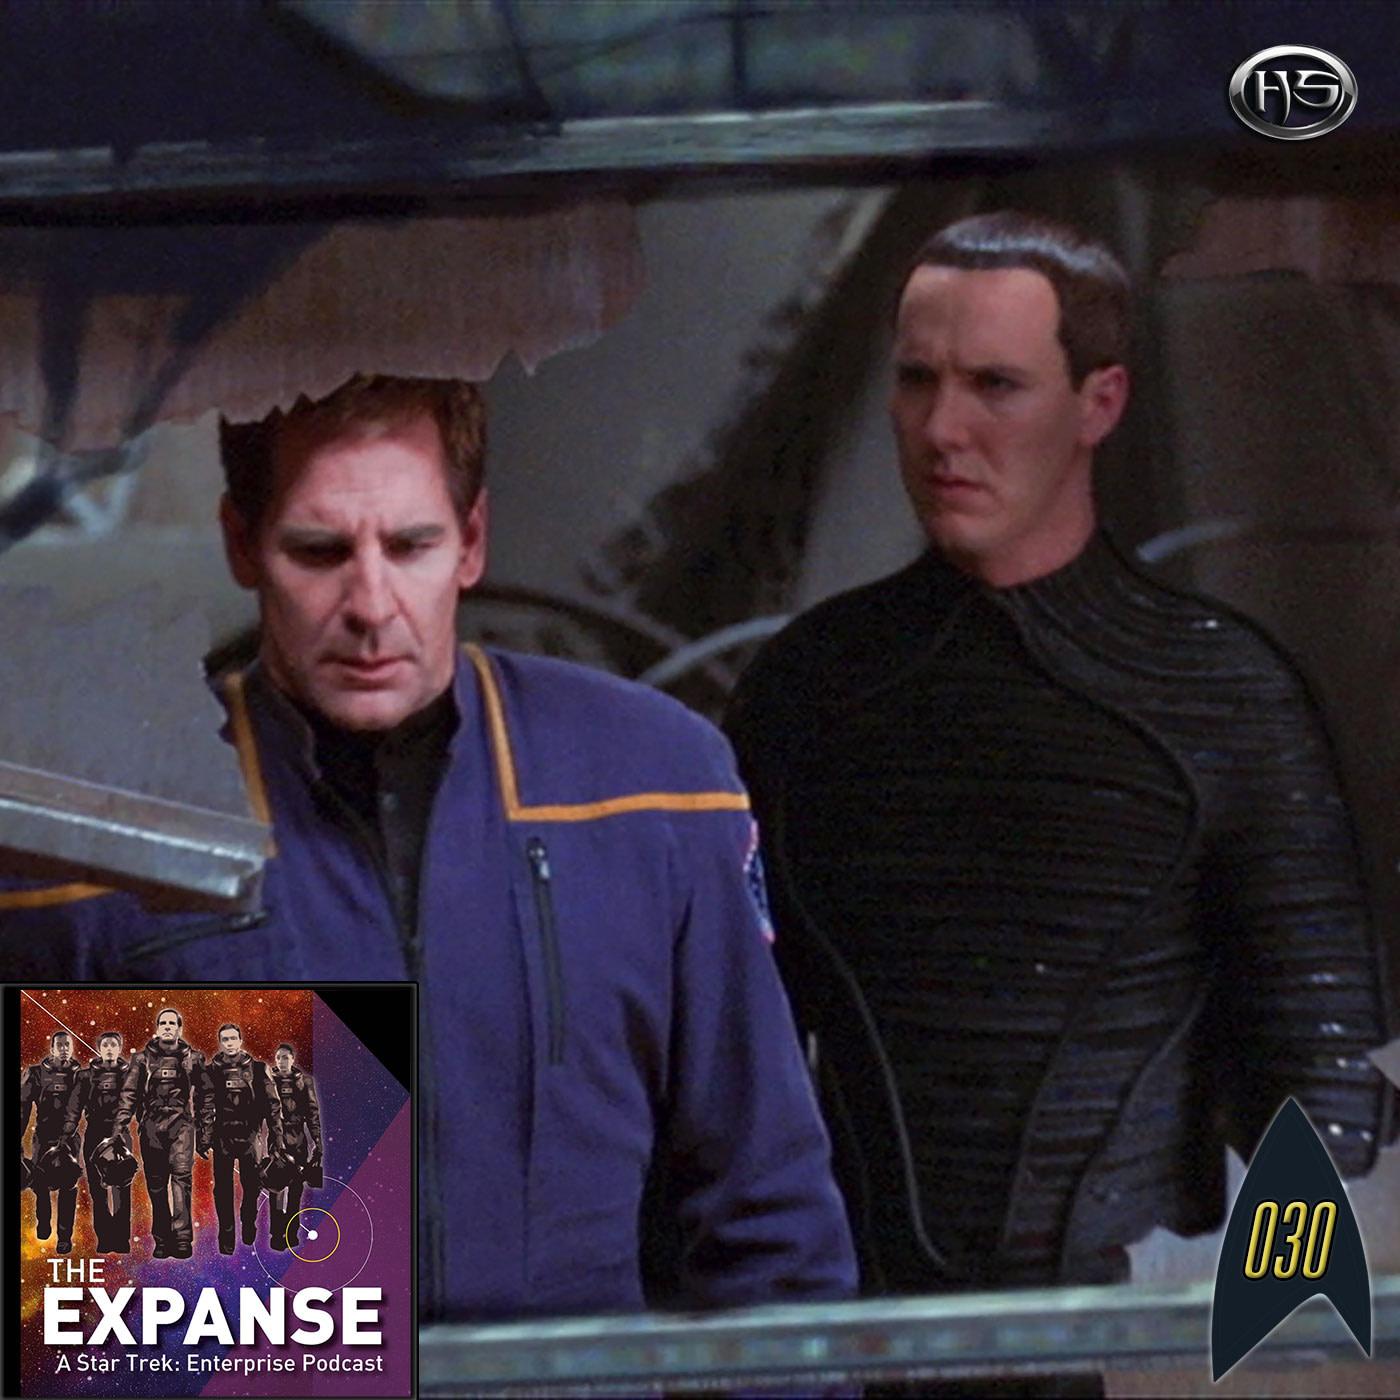 The Expanse Episode 30